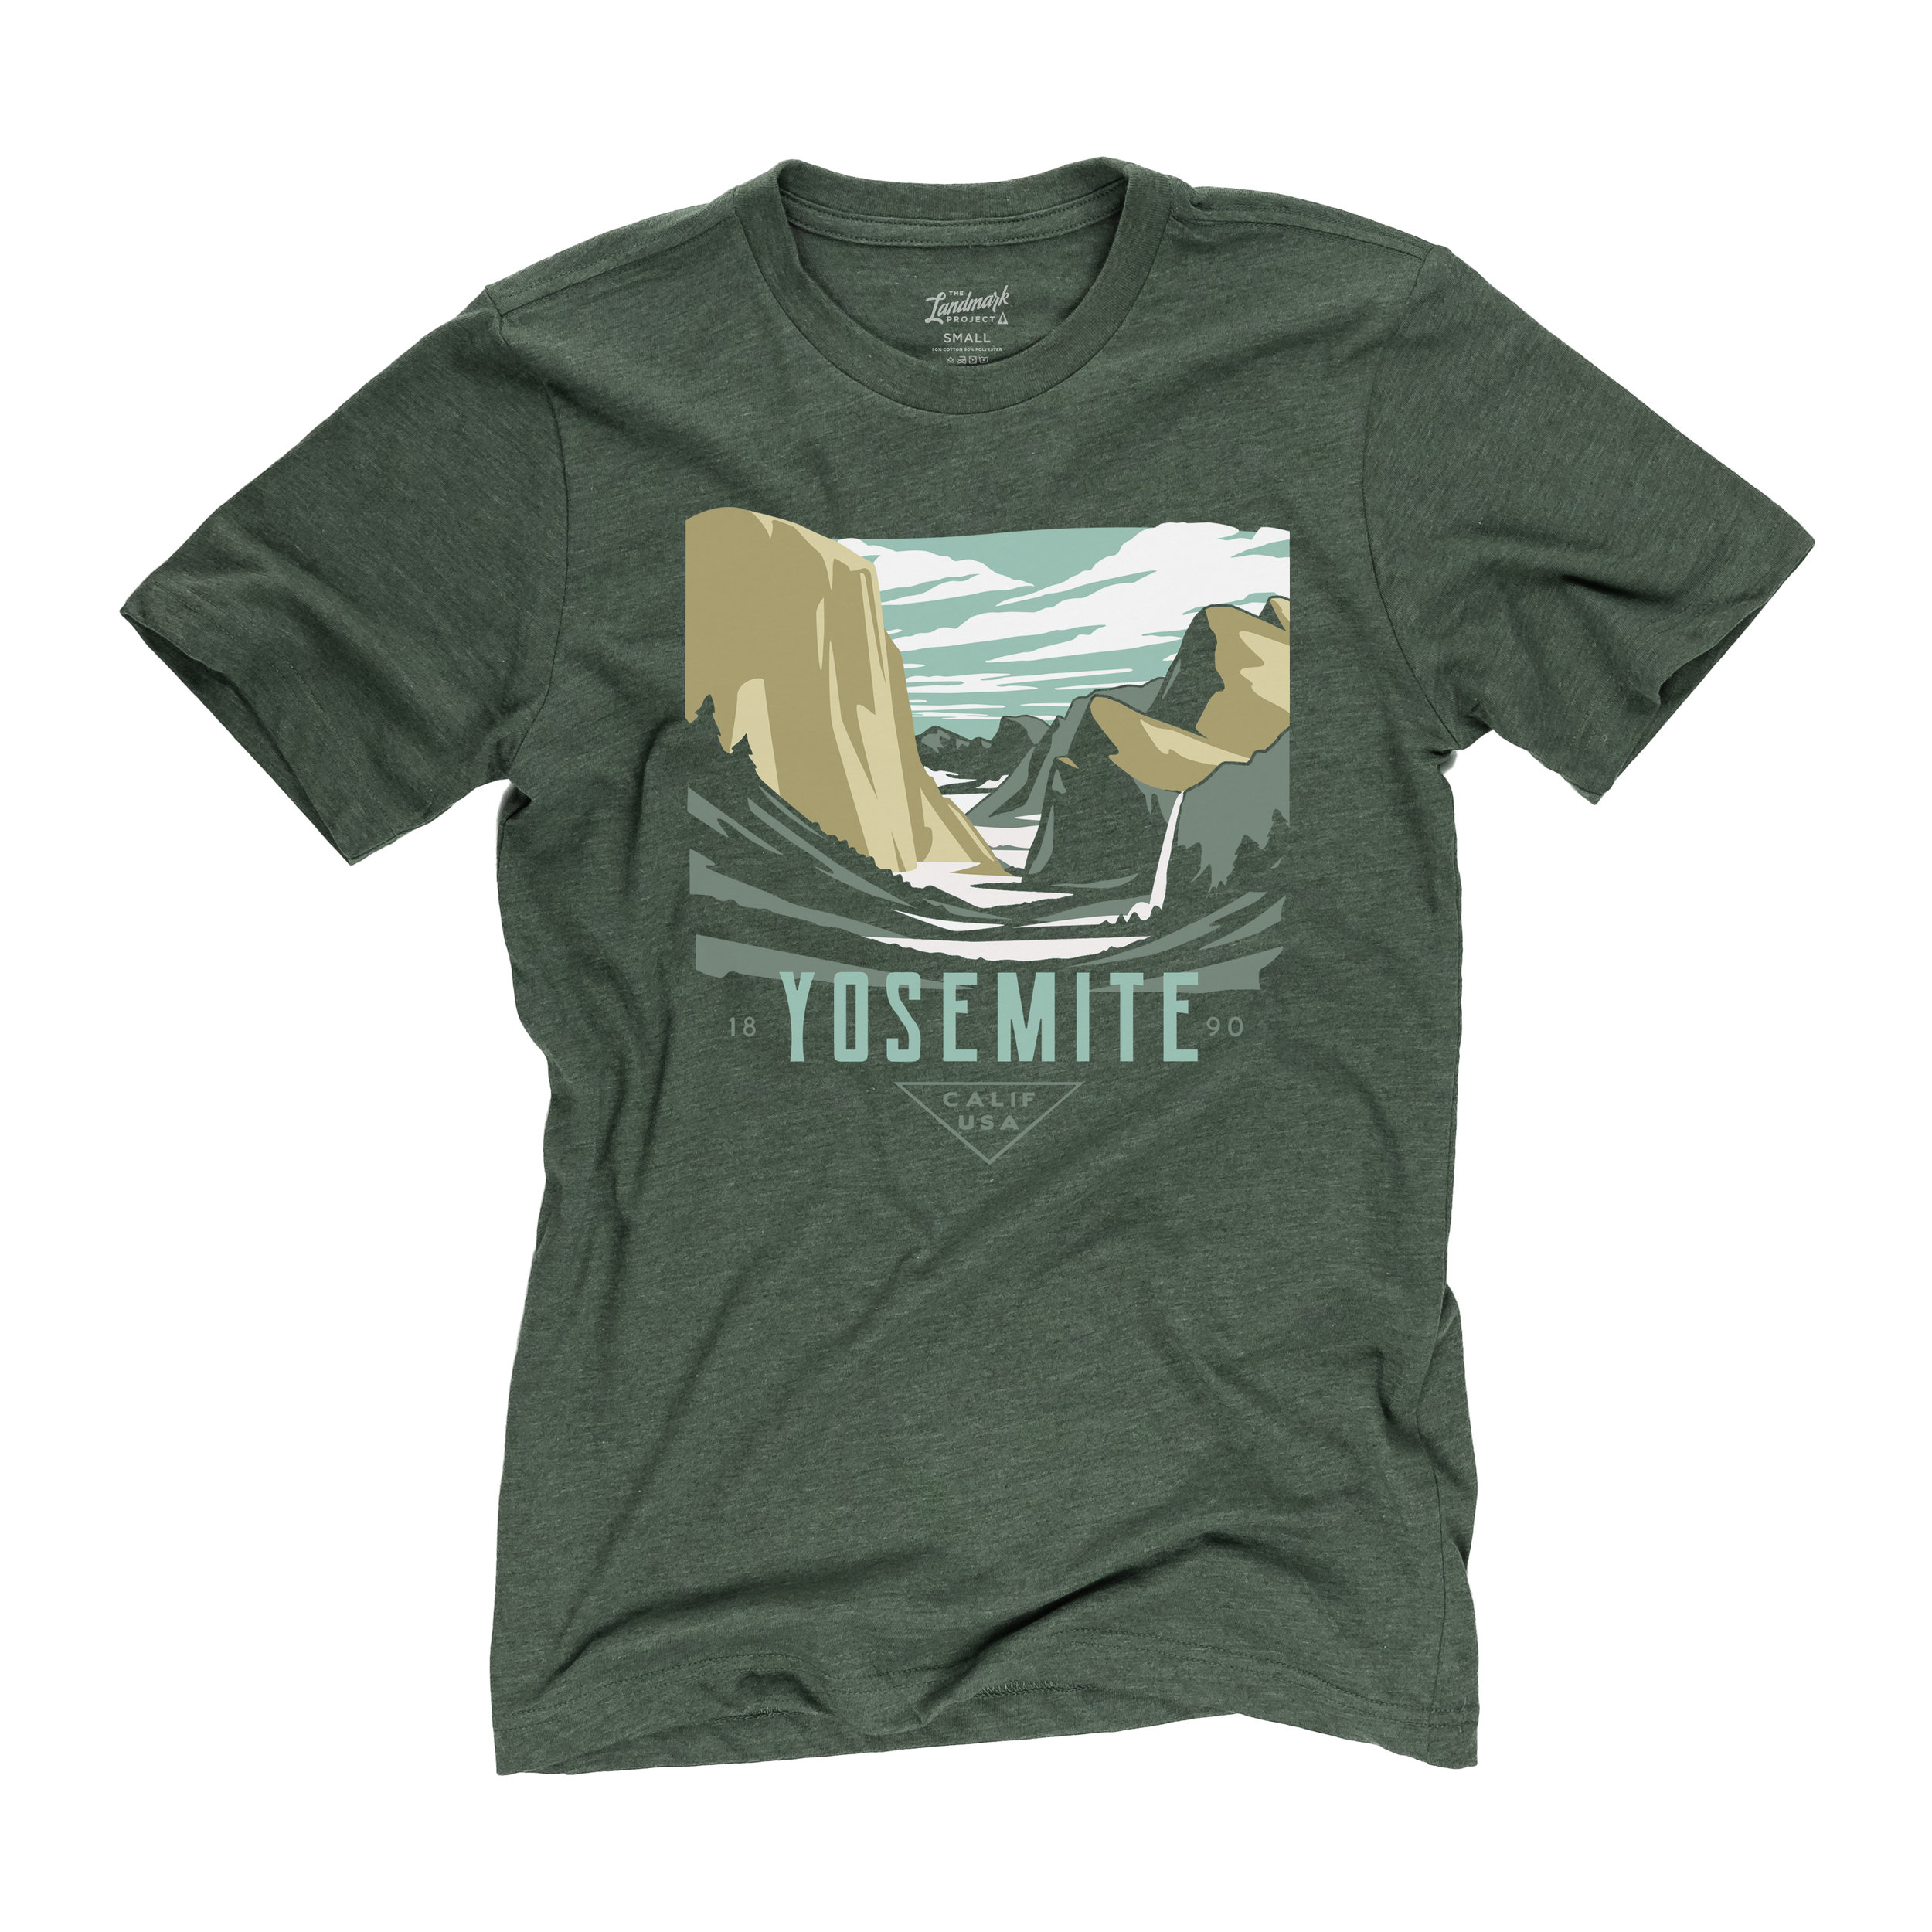 yosemite-conifer-tee.jpg